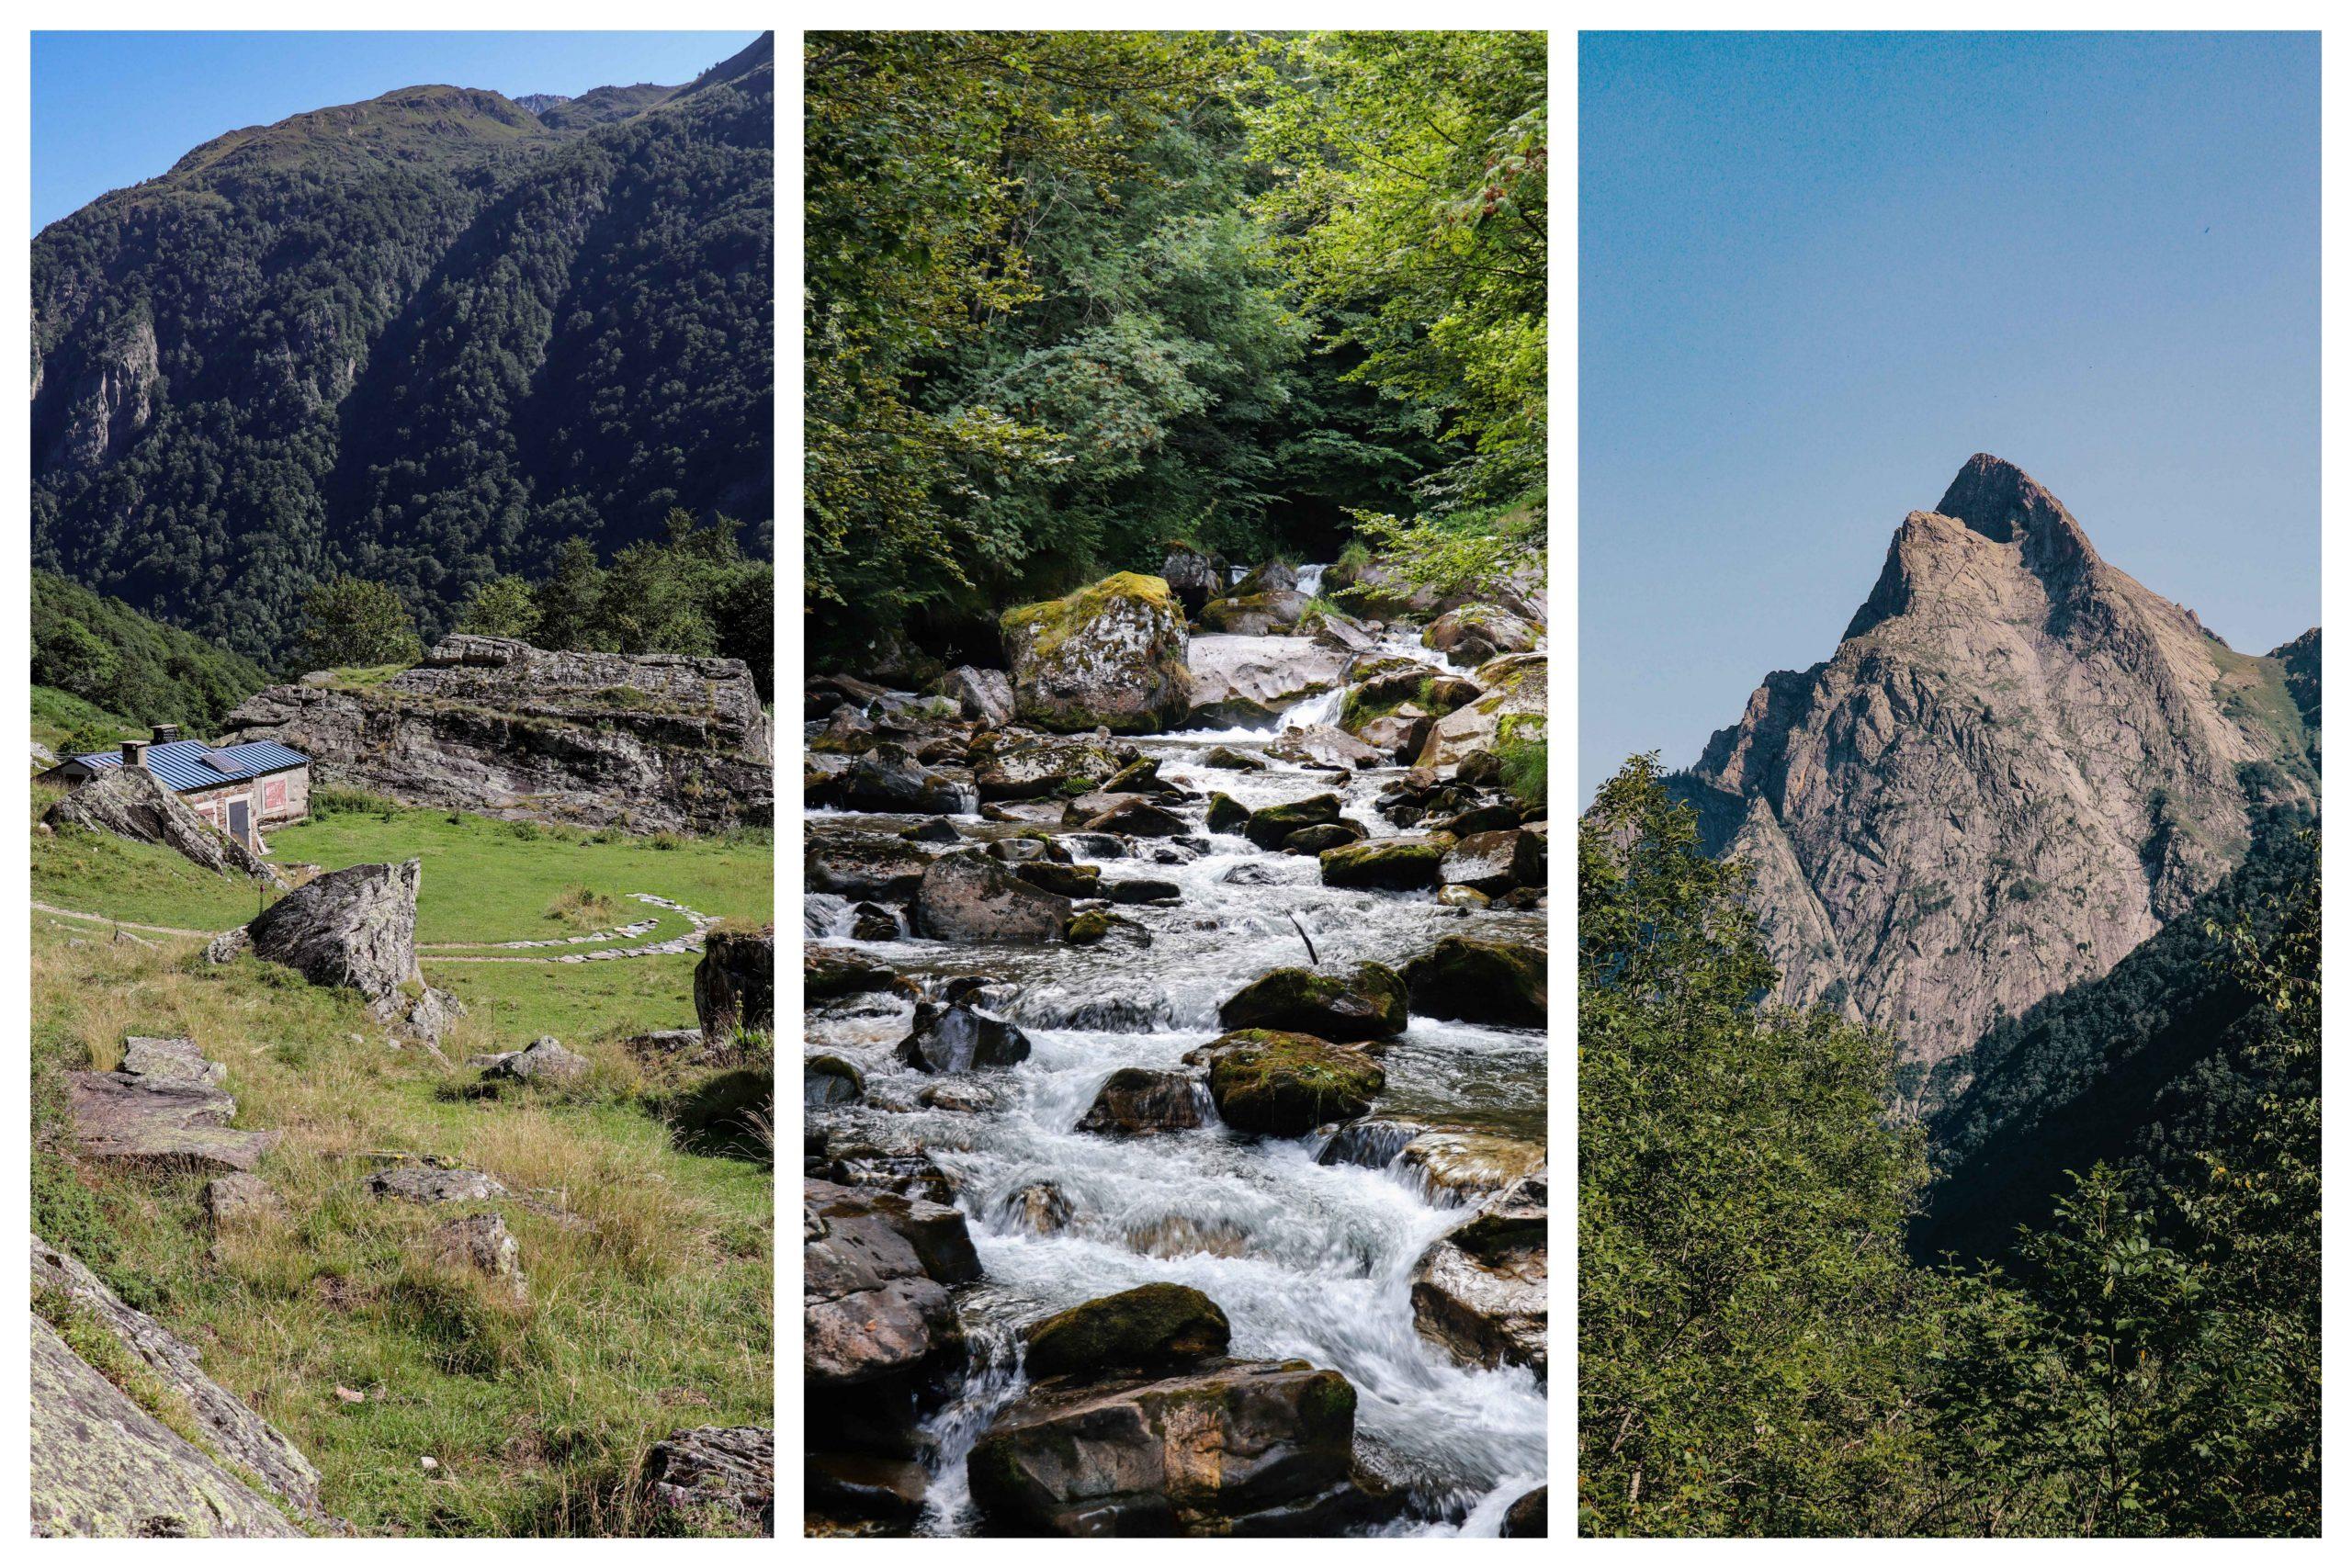 Rando Pyrénées - Orlu - L'Ariège en famille